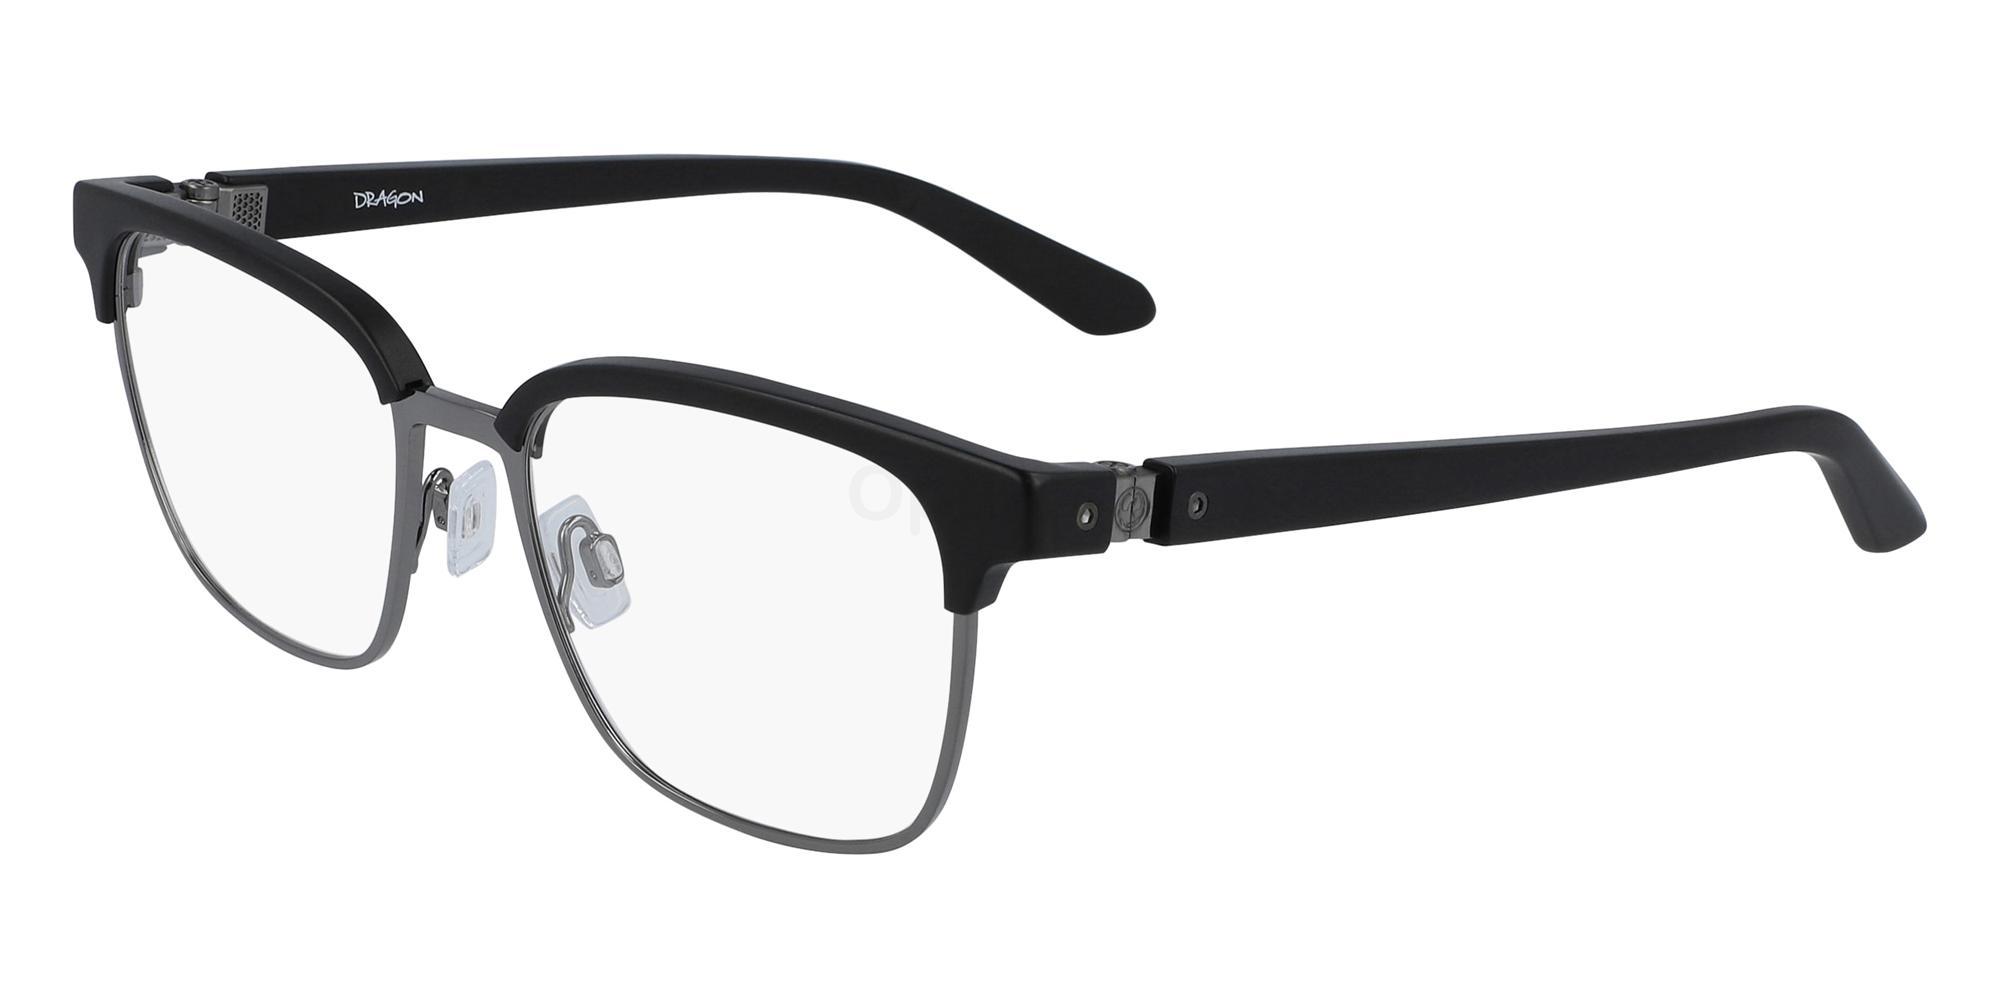 002 DR7003 Glasses, Dragon